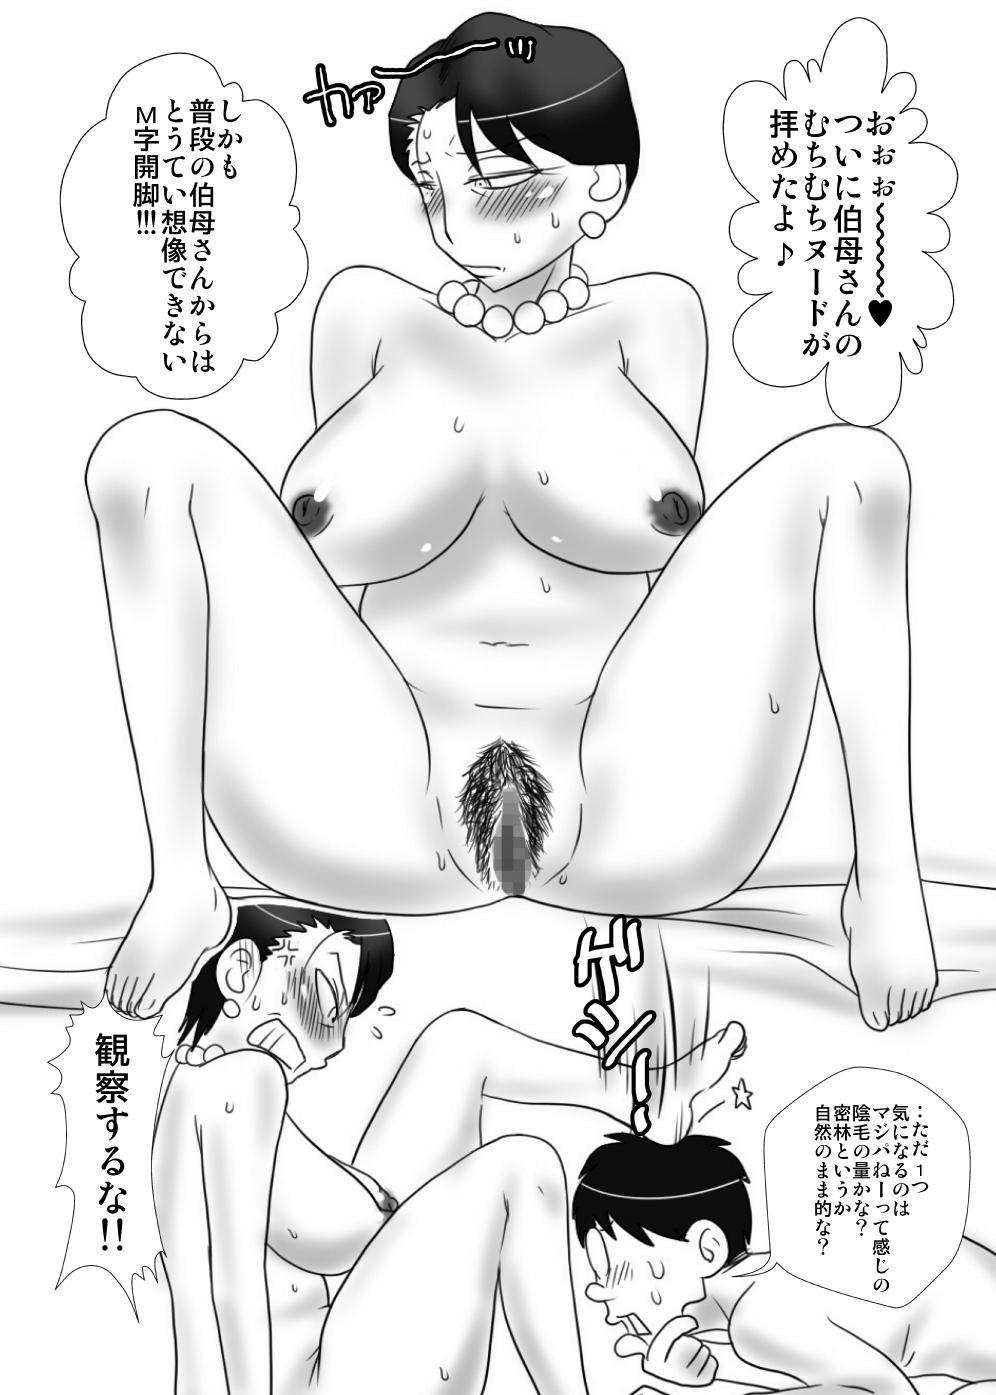 Oba-san o Otosuze! 19